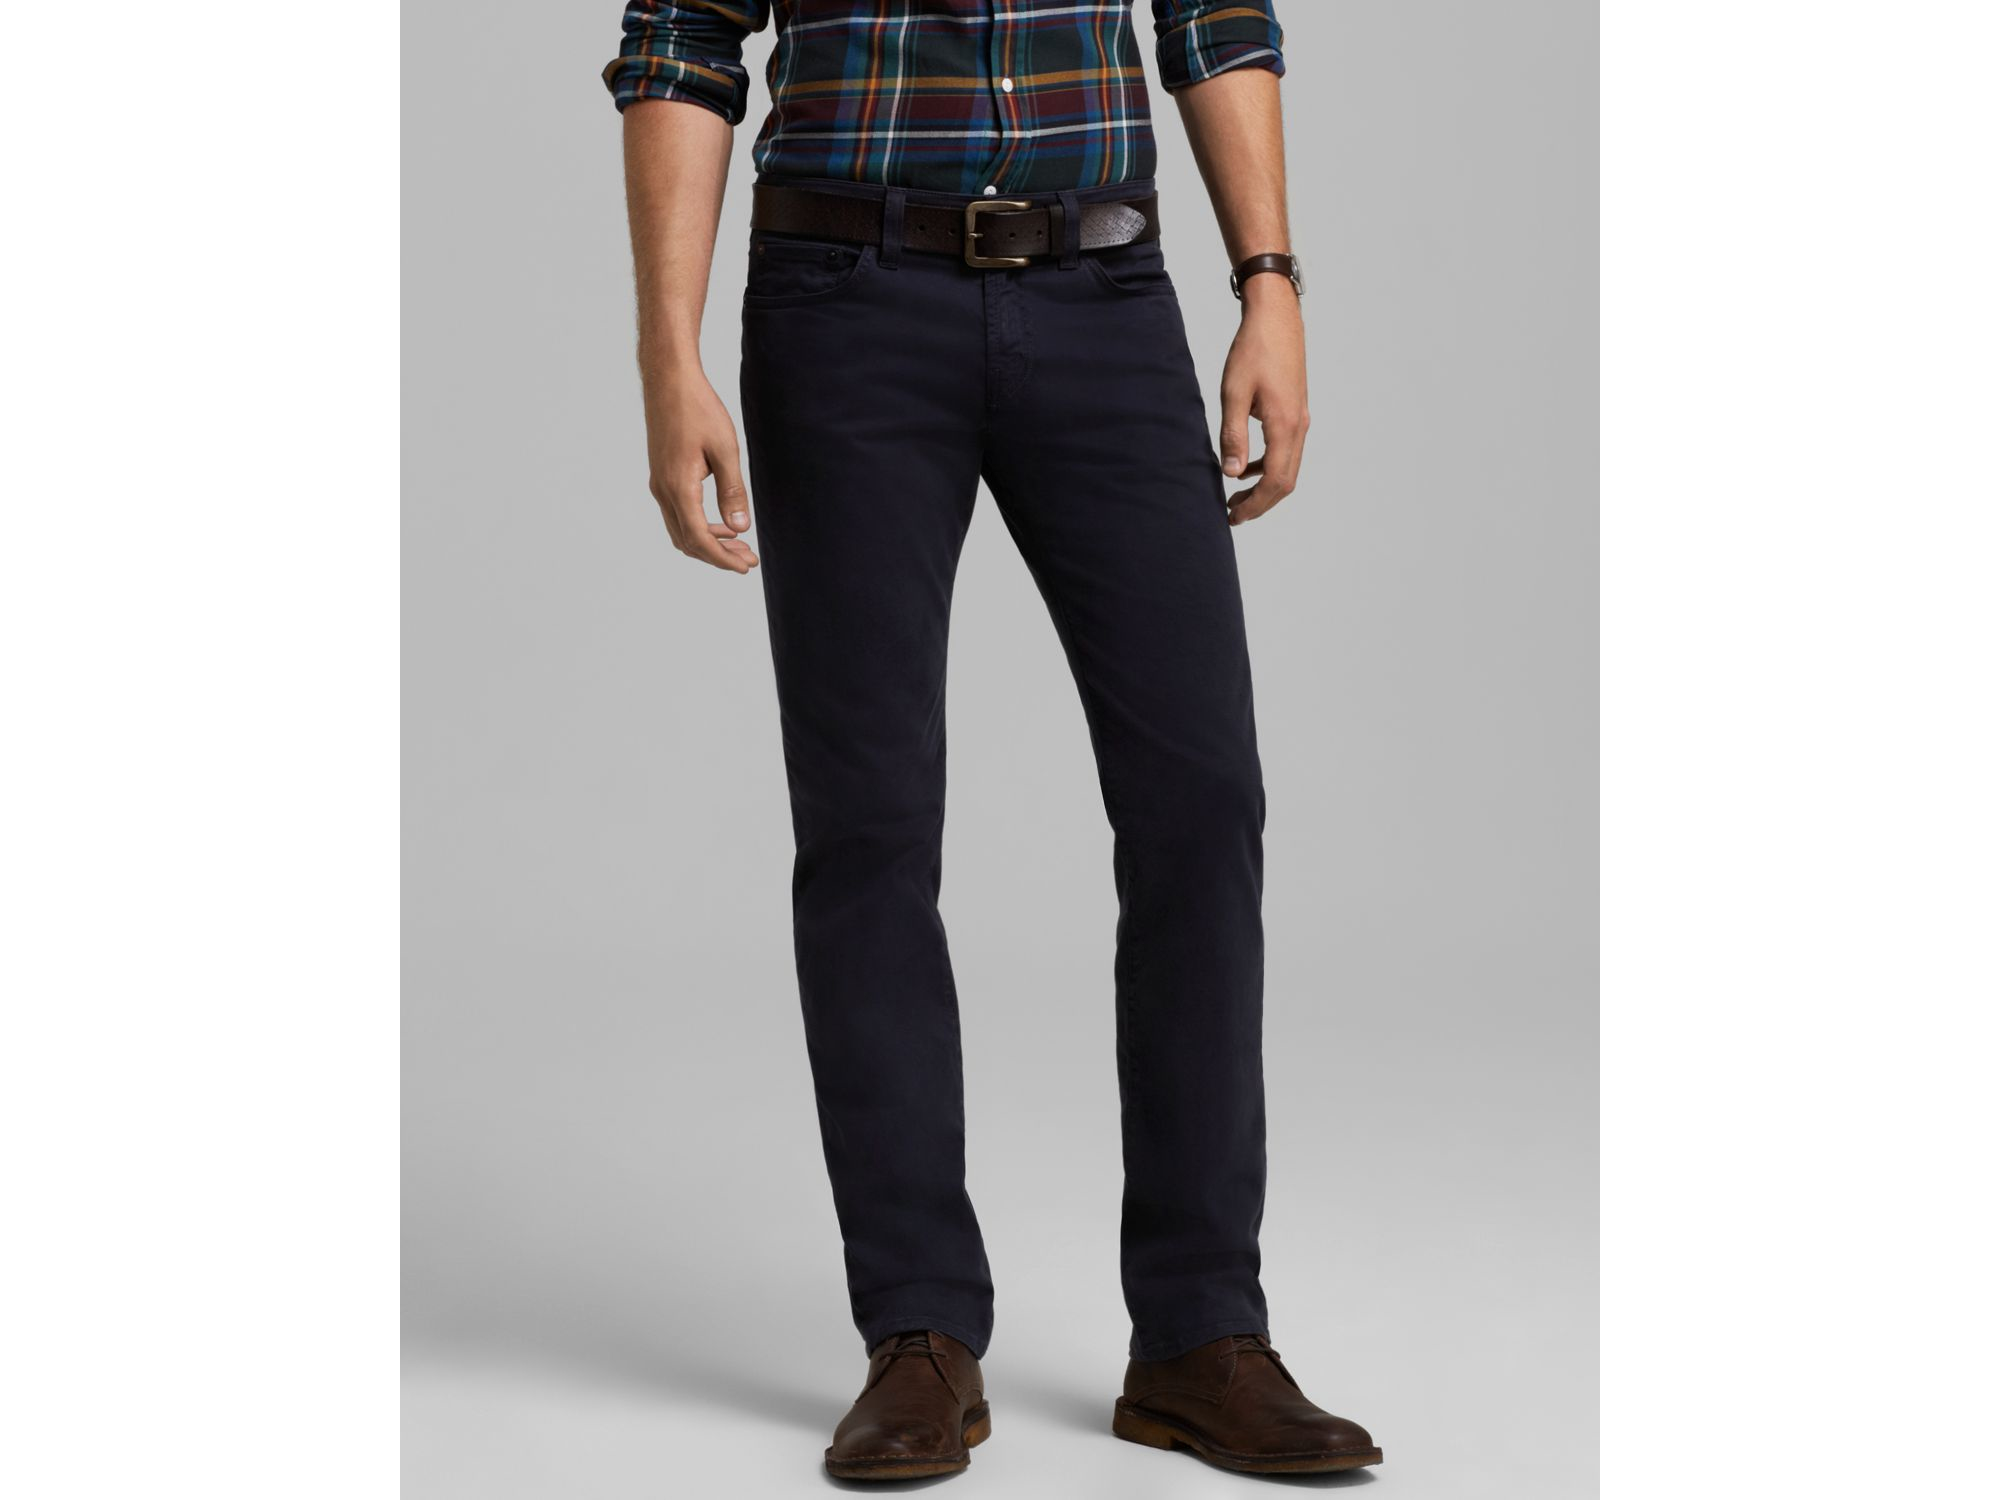 jeans depth of - photo #12